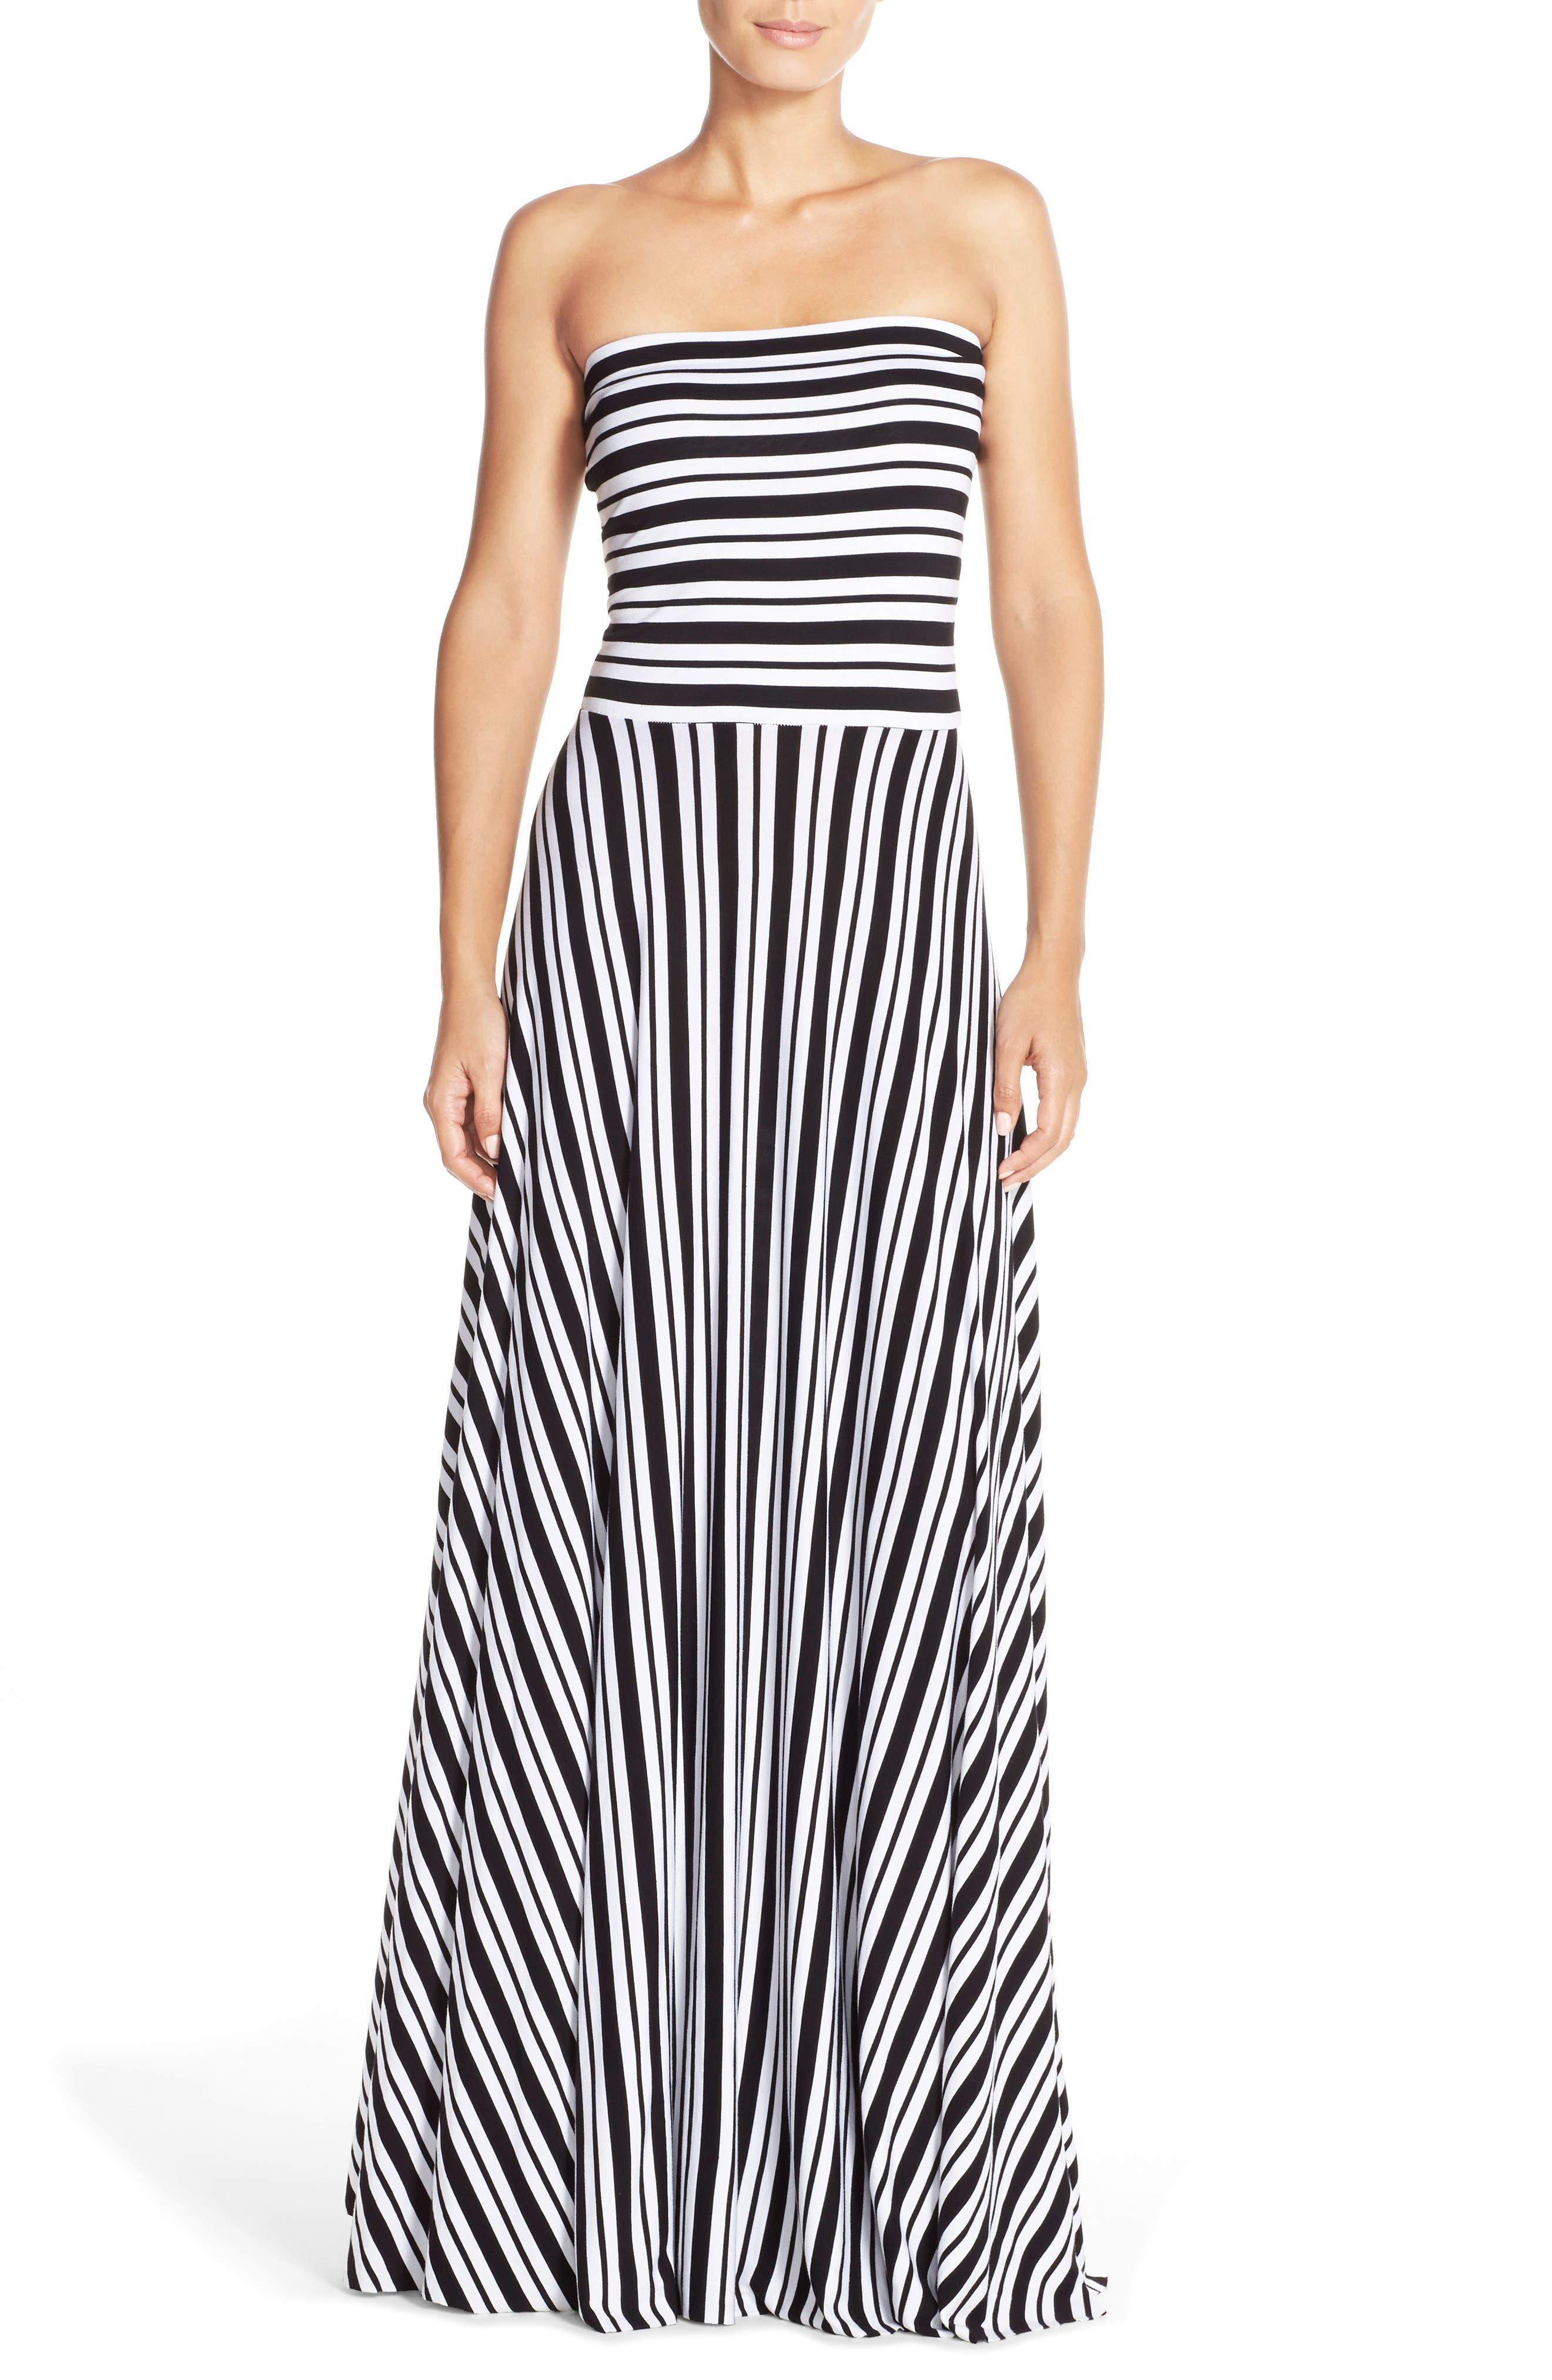 White Black Strapless Dress